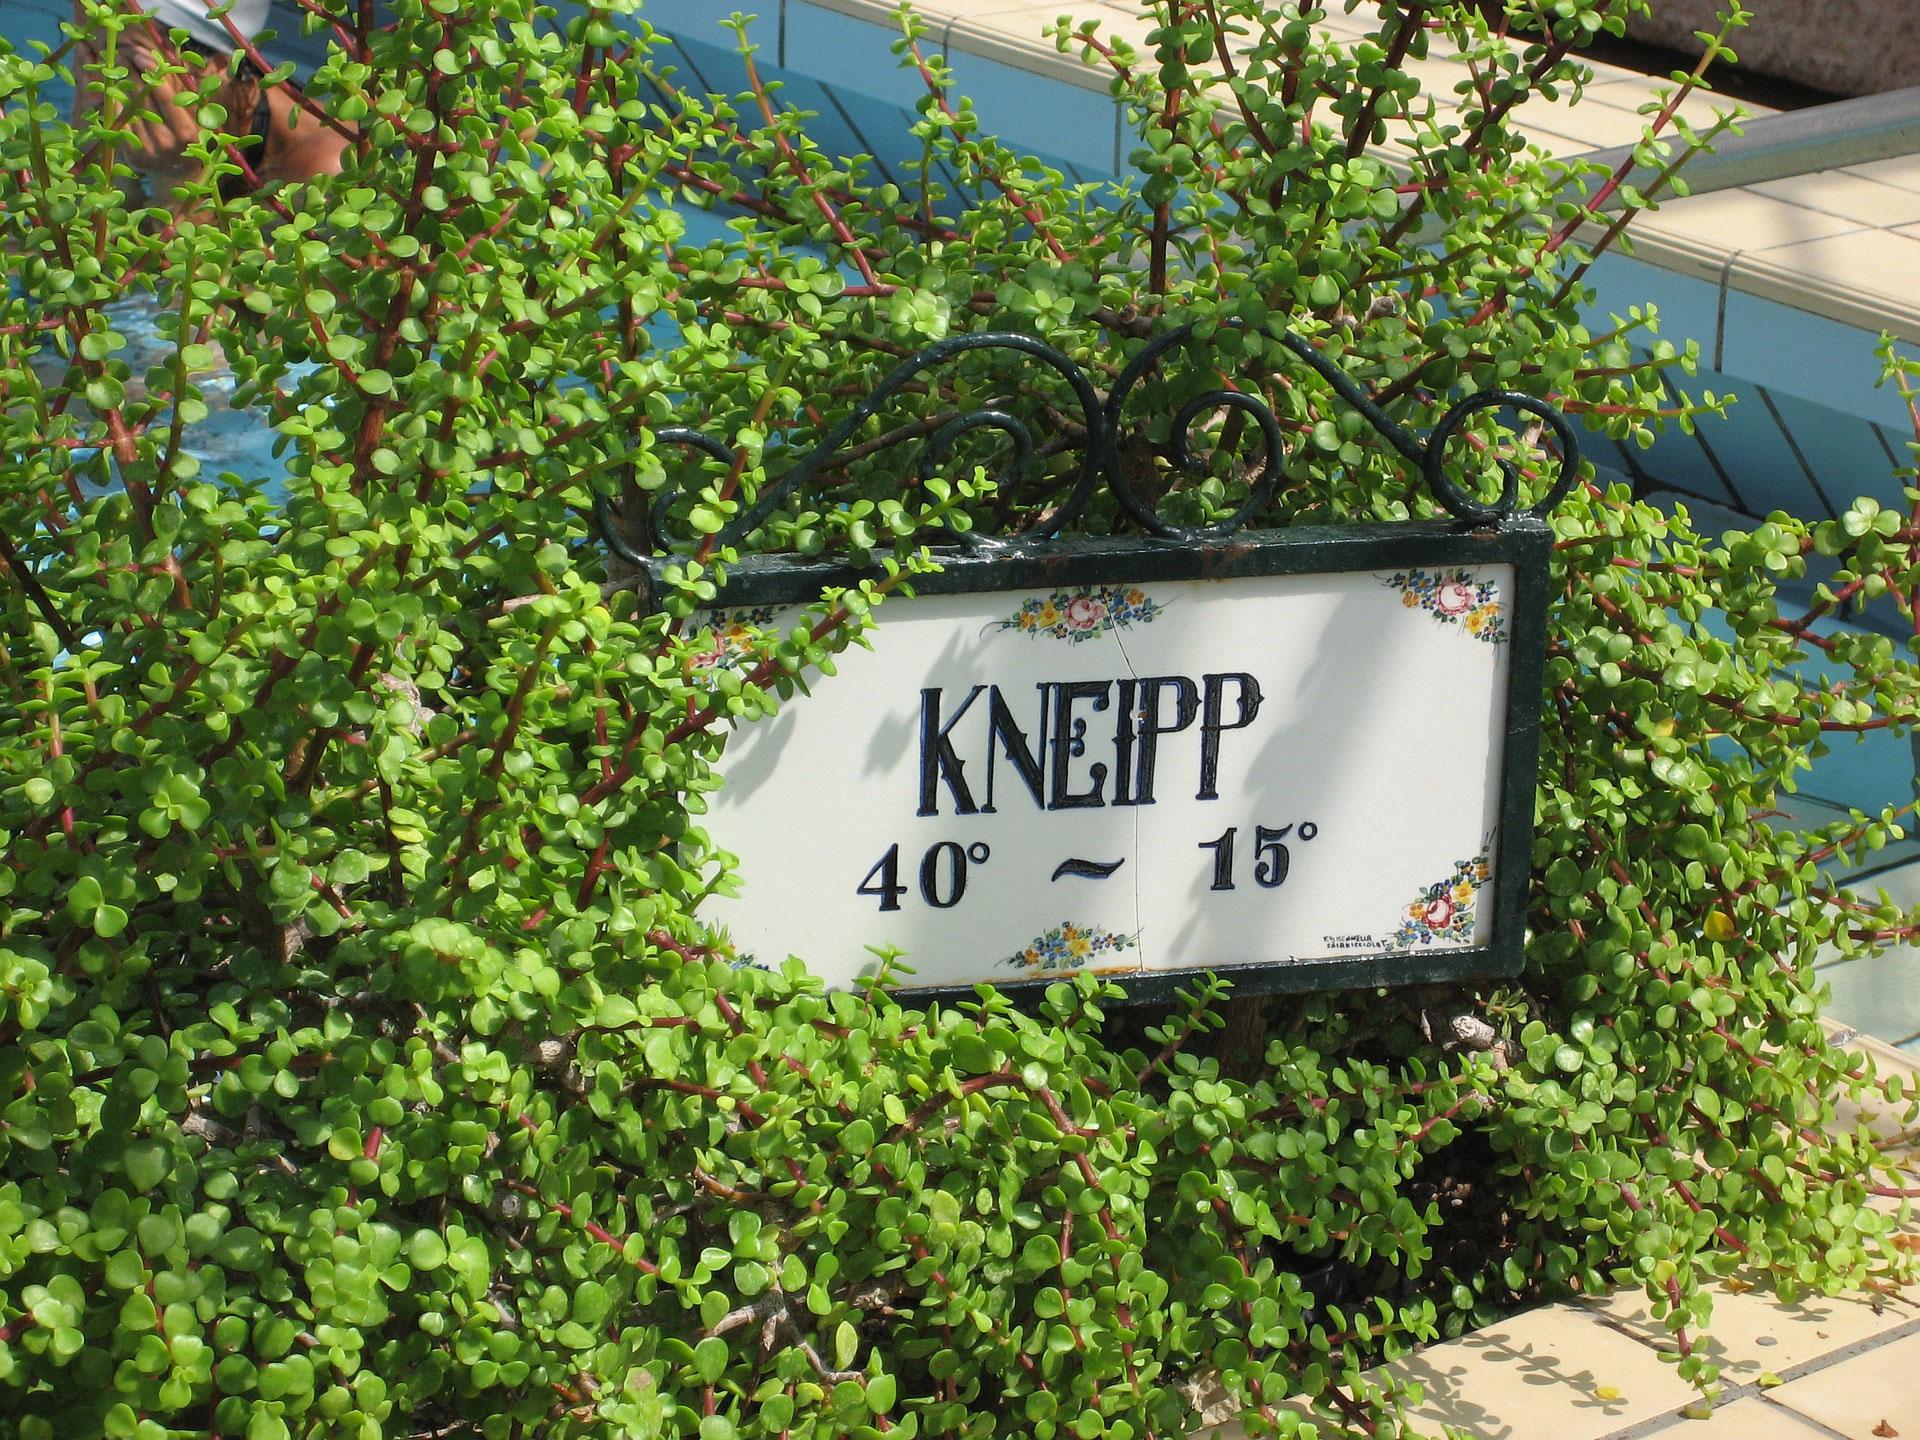 Kneipp-Erlebnis-Wandertour im Lahn-Dill-Bergland